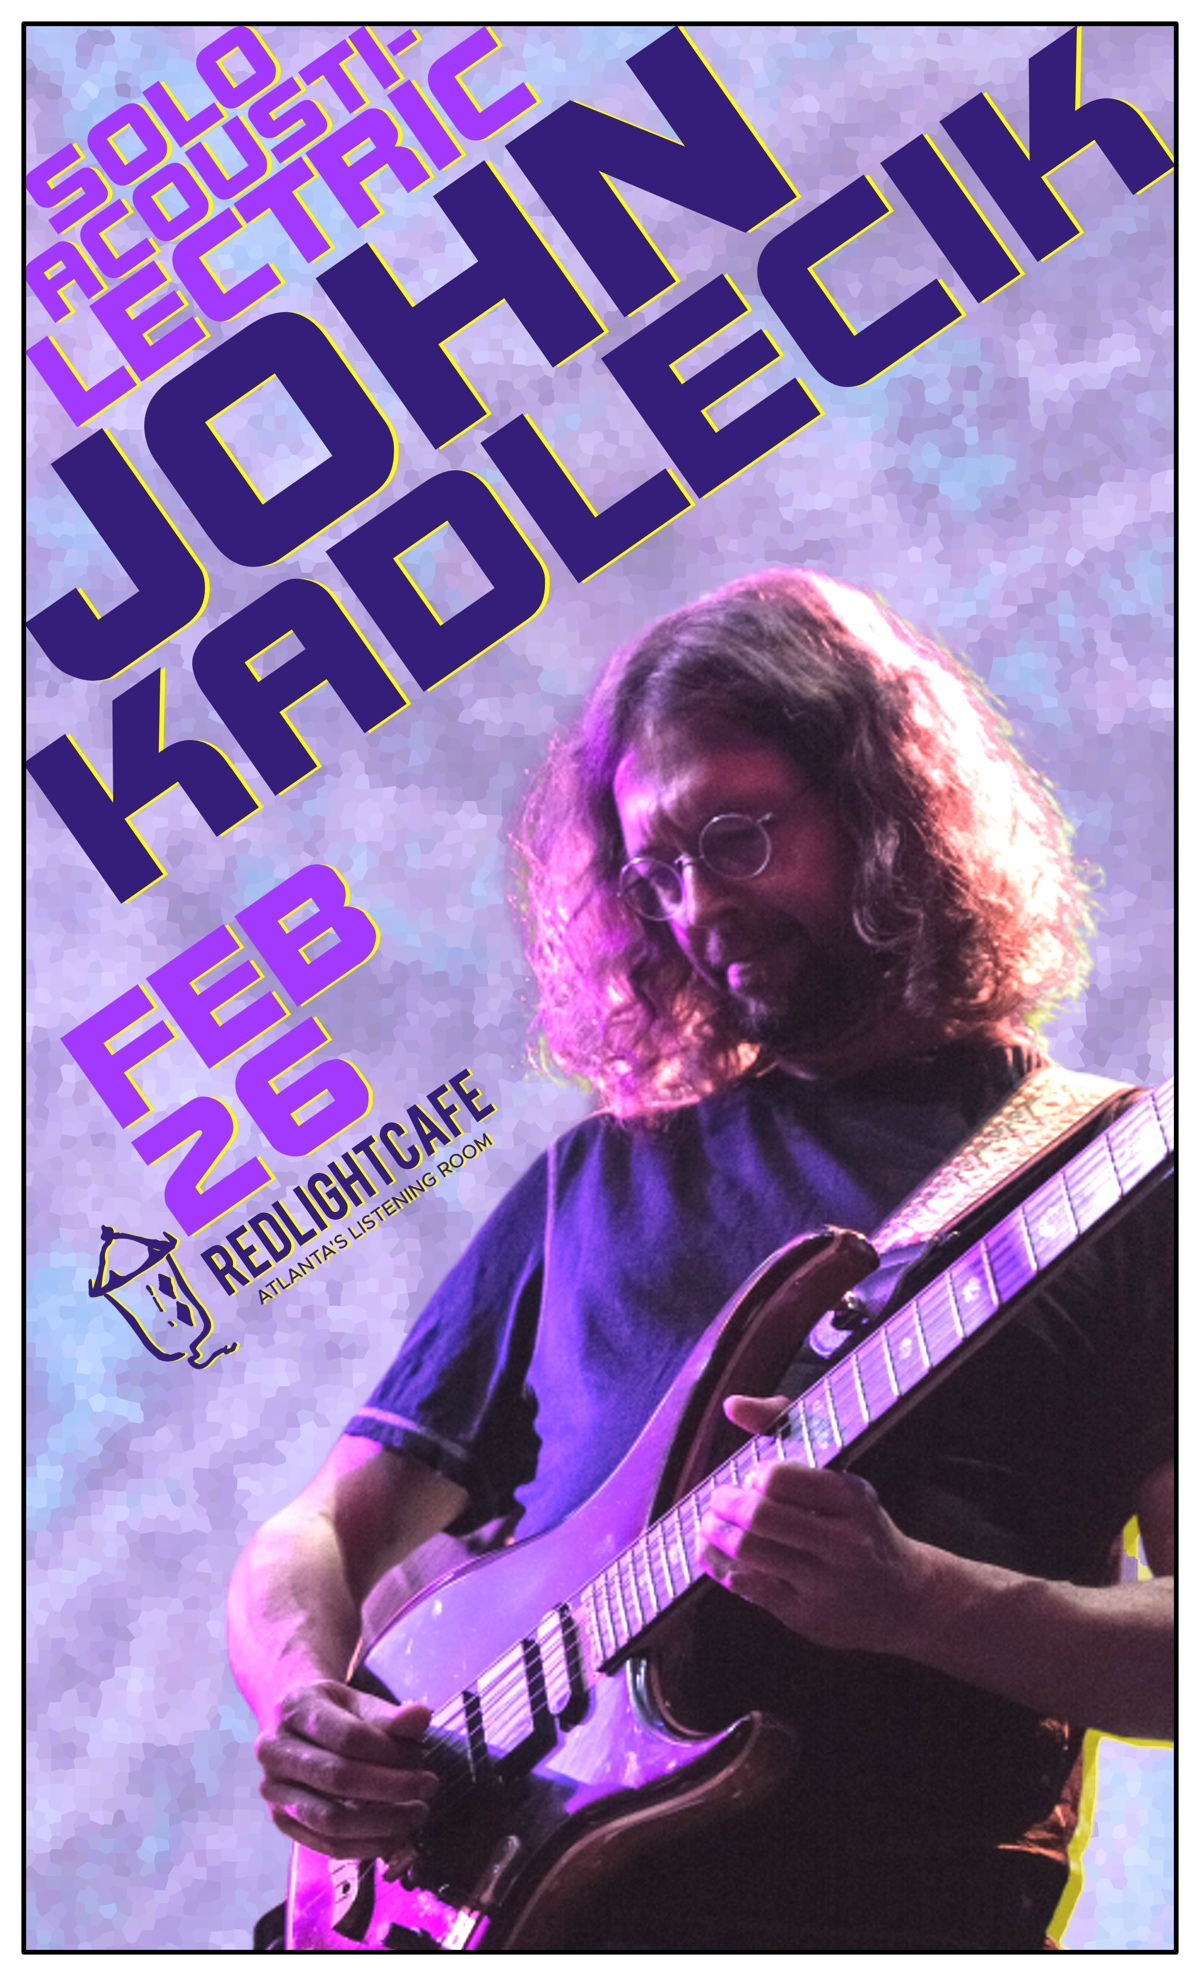 John Kadlecik: Solo Acousti-Lectric — February 26, 2019 — Red Light Café, Atlanta, GA